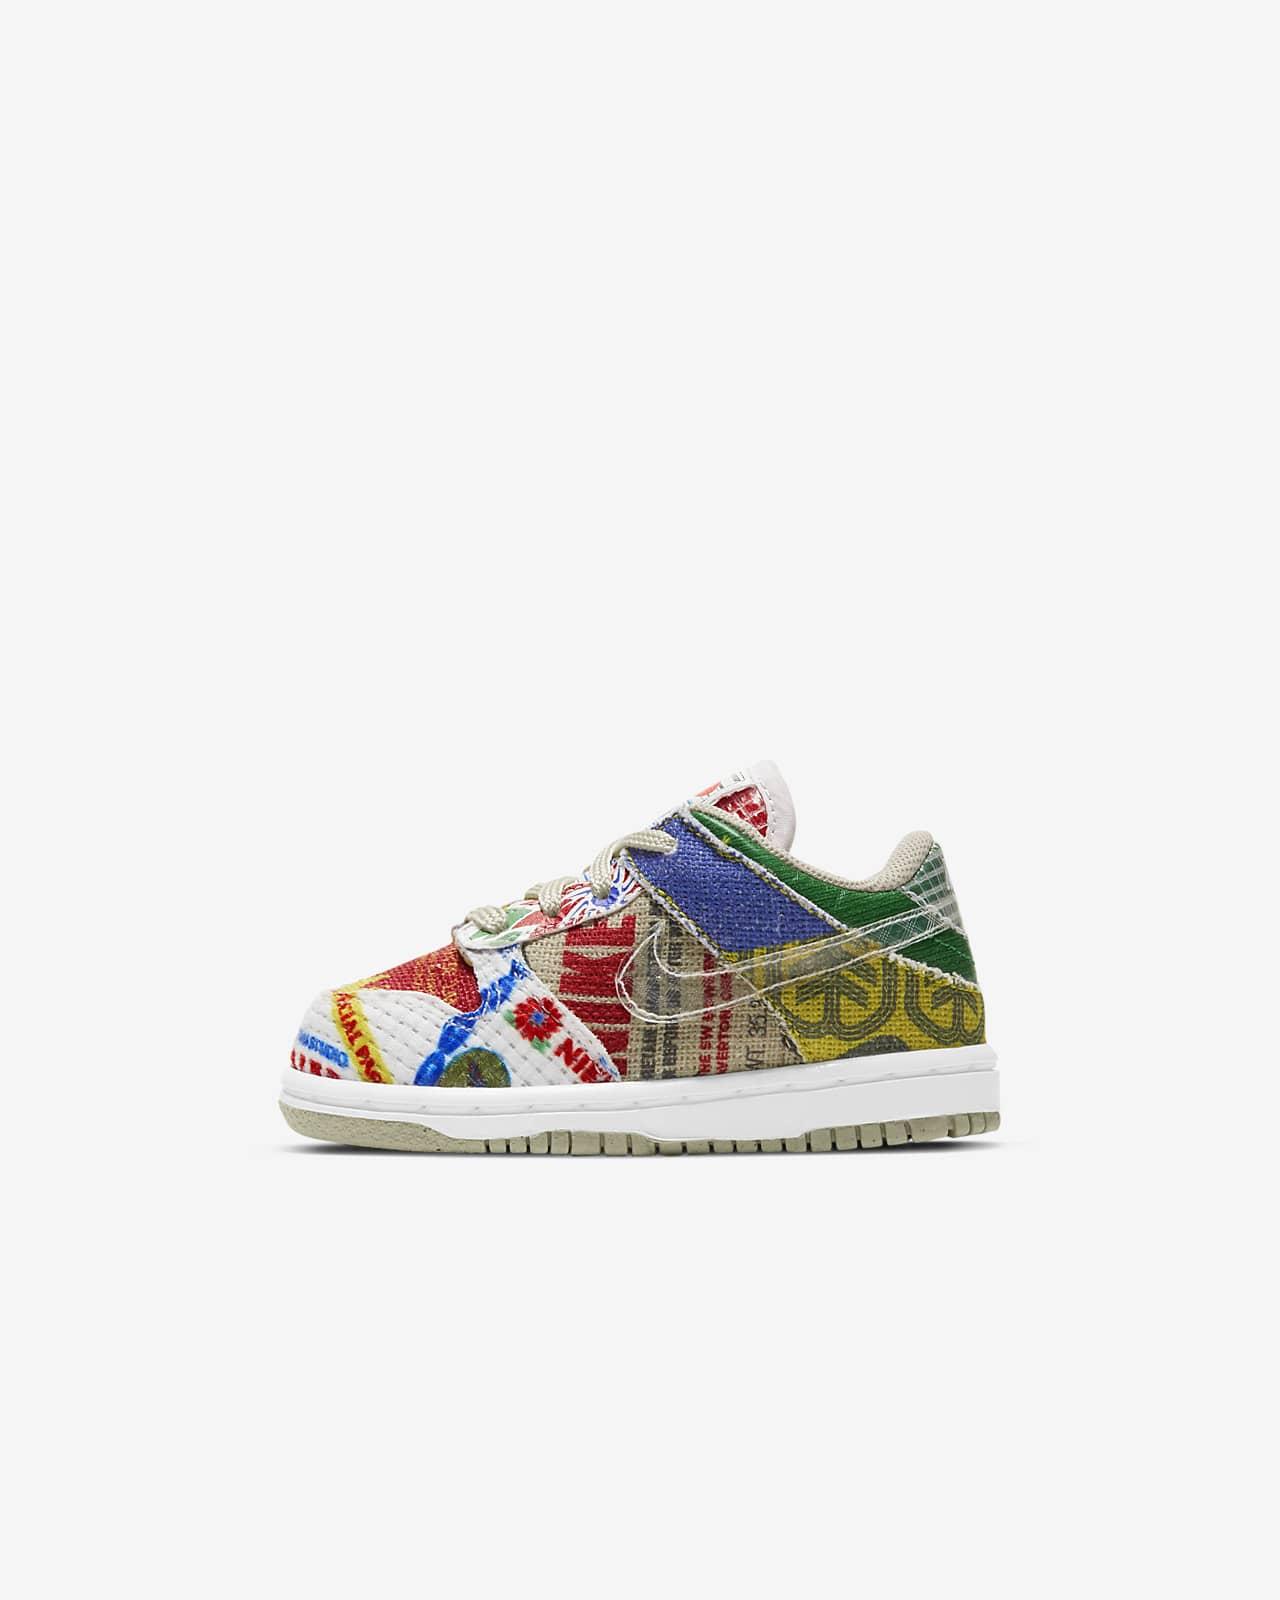 Nike Dunk 低筒 SP 嬰幼兒鞋款